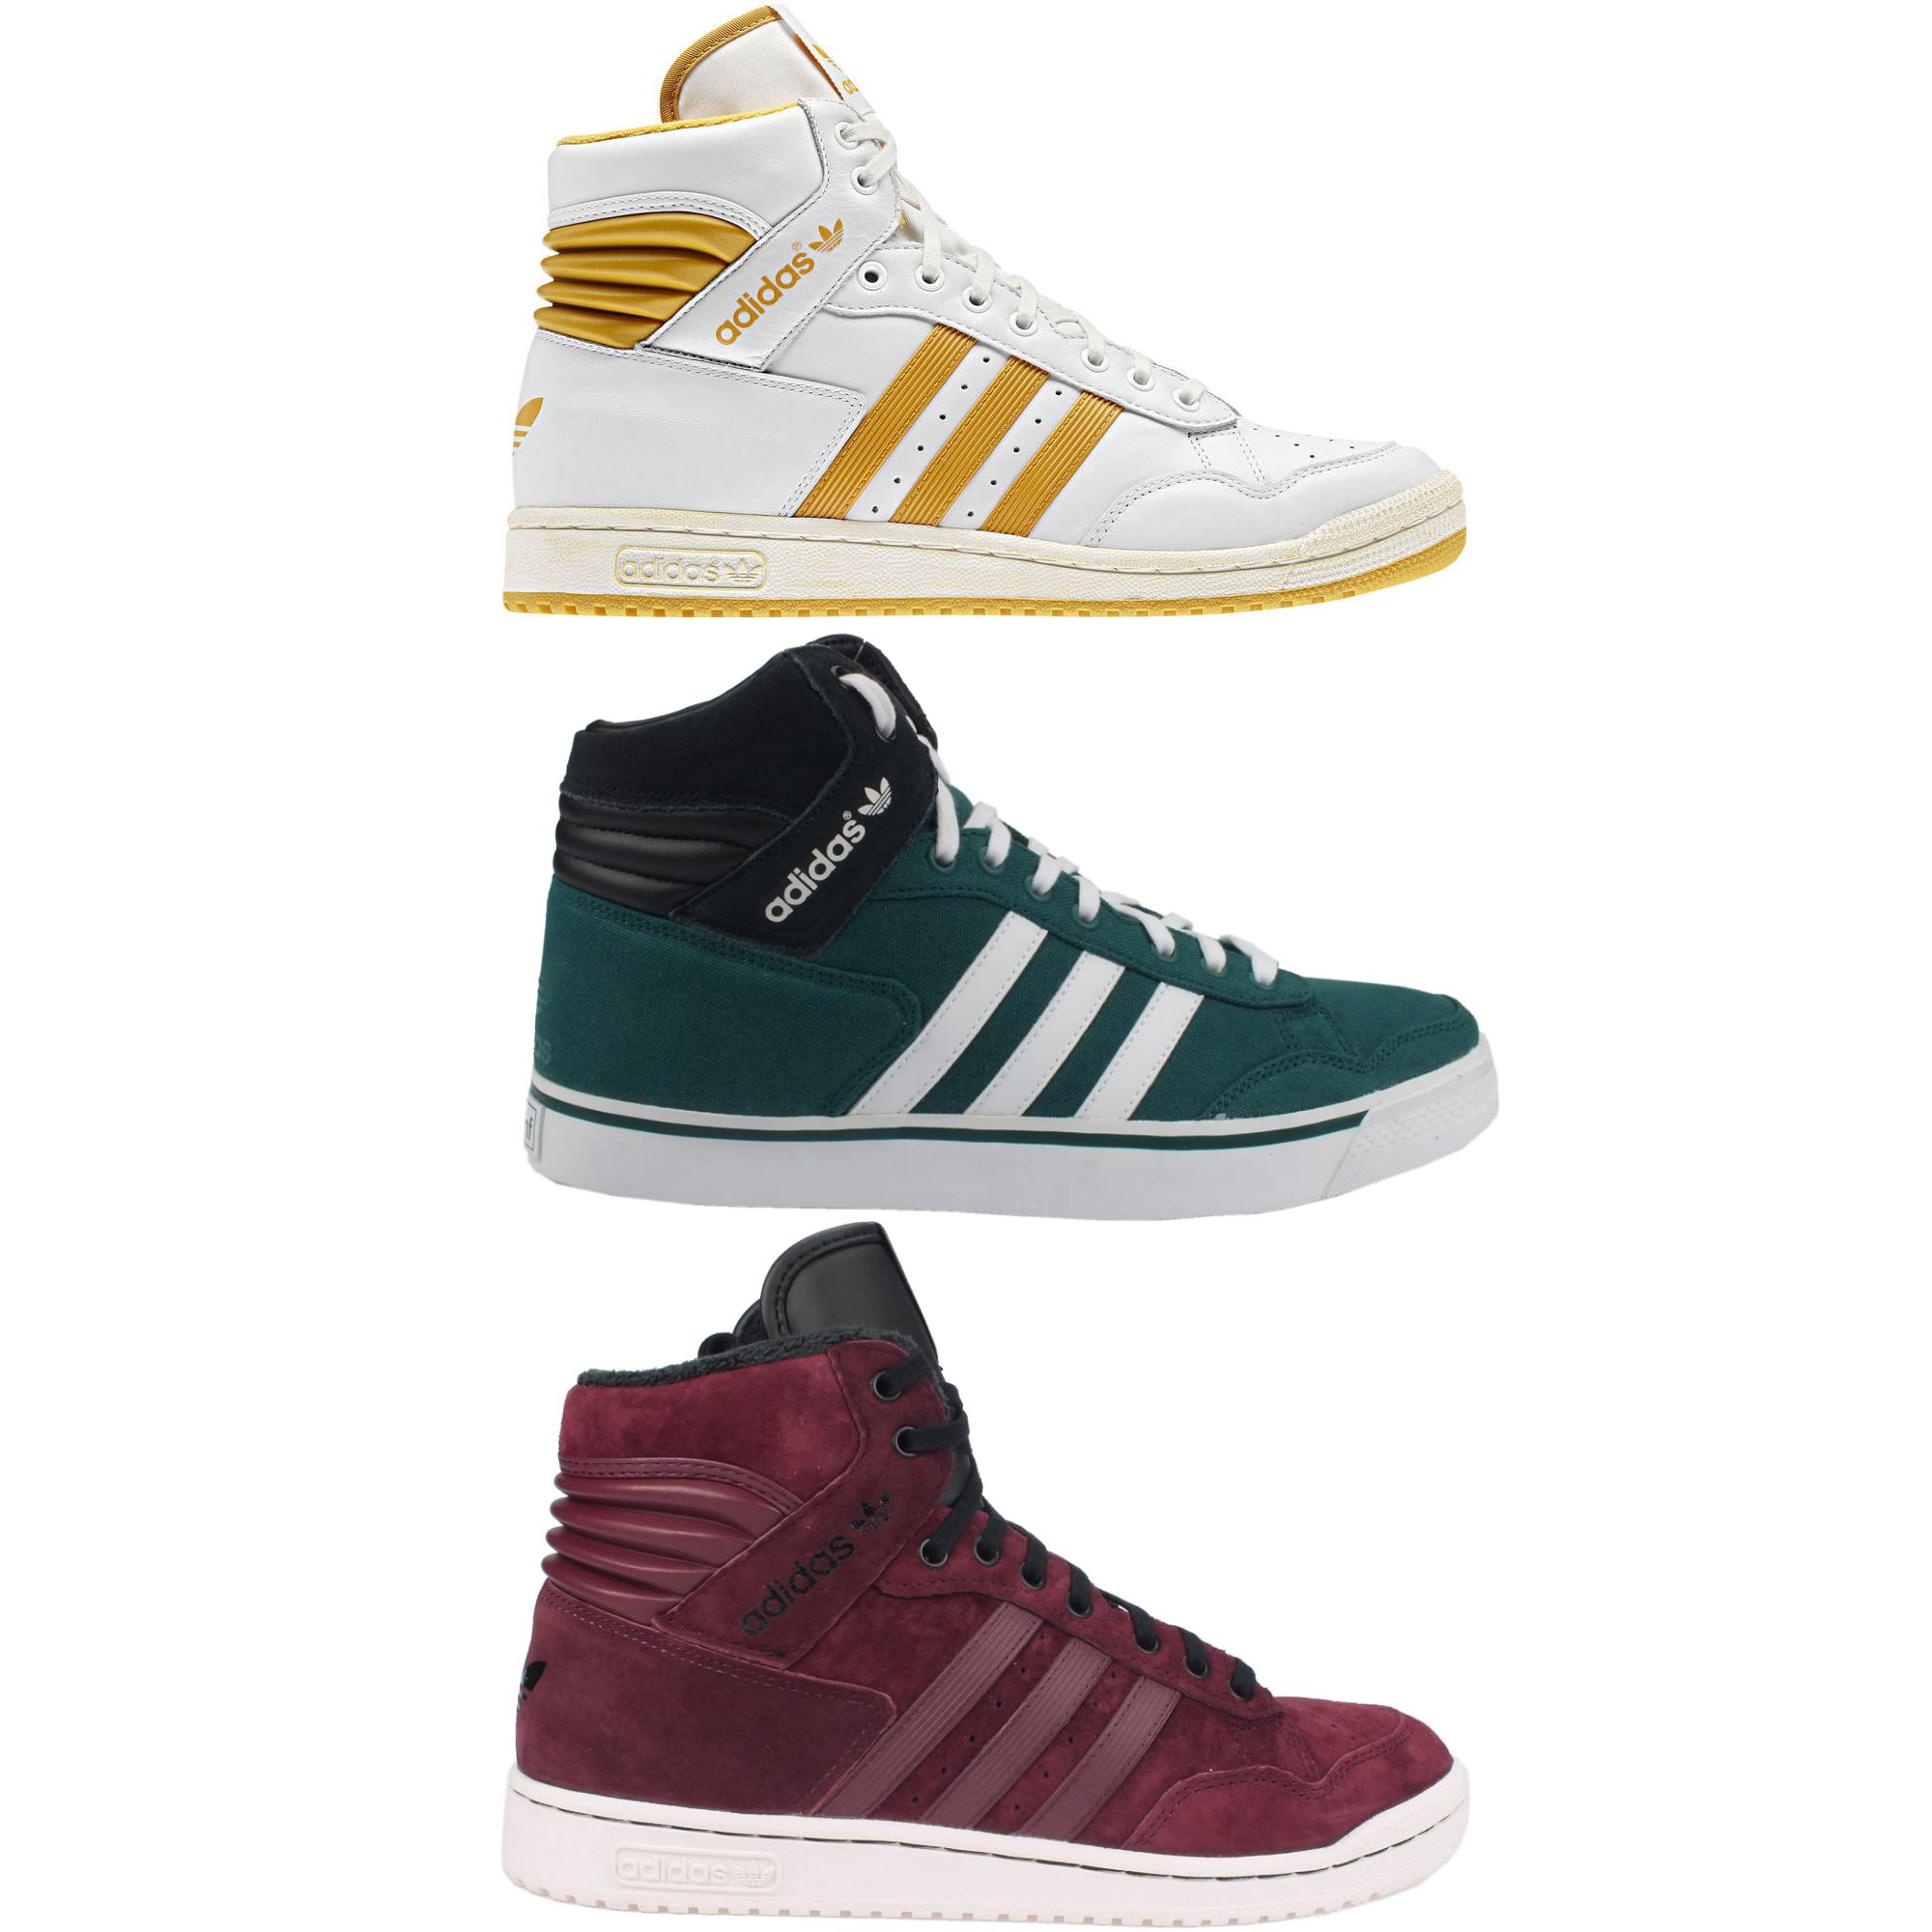 adidas originals pro conference hi men 39 s high top sneaker. Black Bedroom Furniture Sets. Home Design Ideas